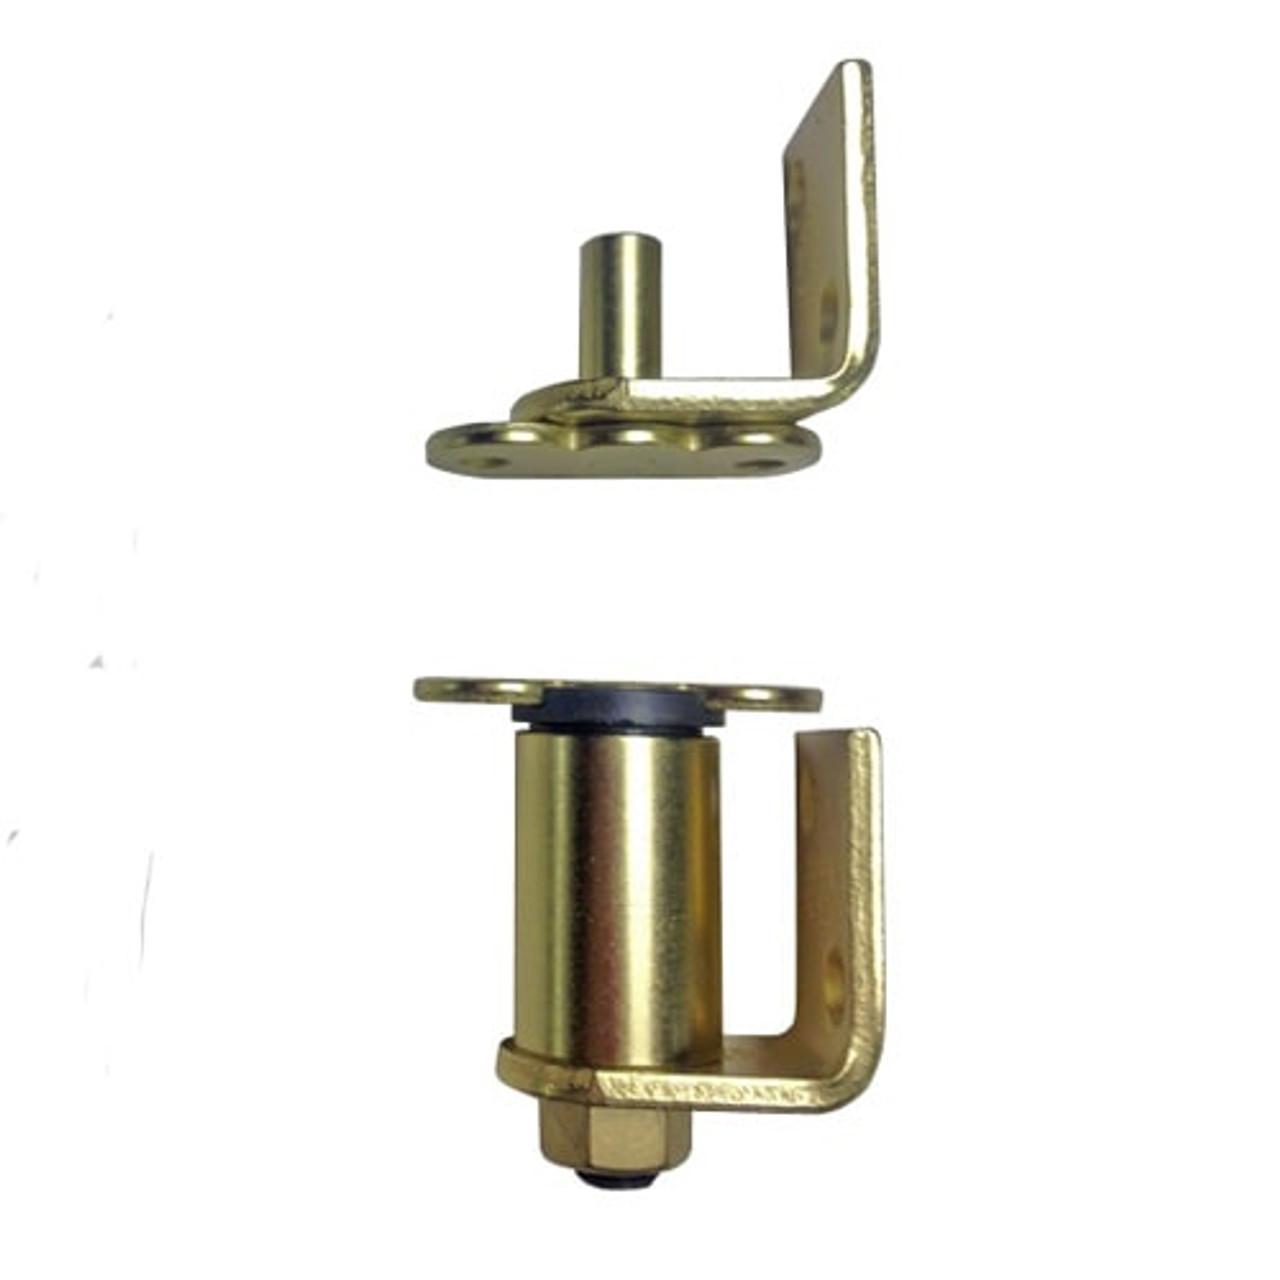 Gravity Commercial Grade Hinge /Hardware for Cafe Doors (S. Brass)